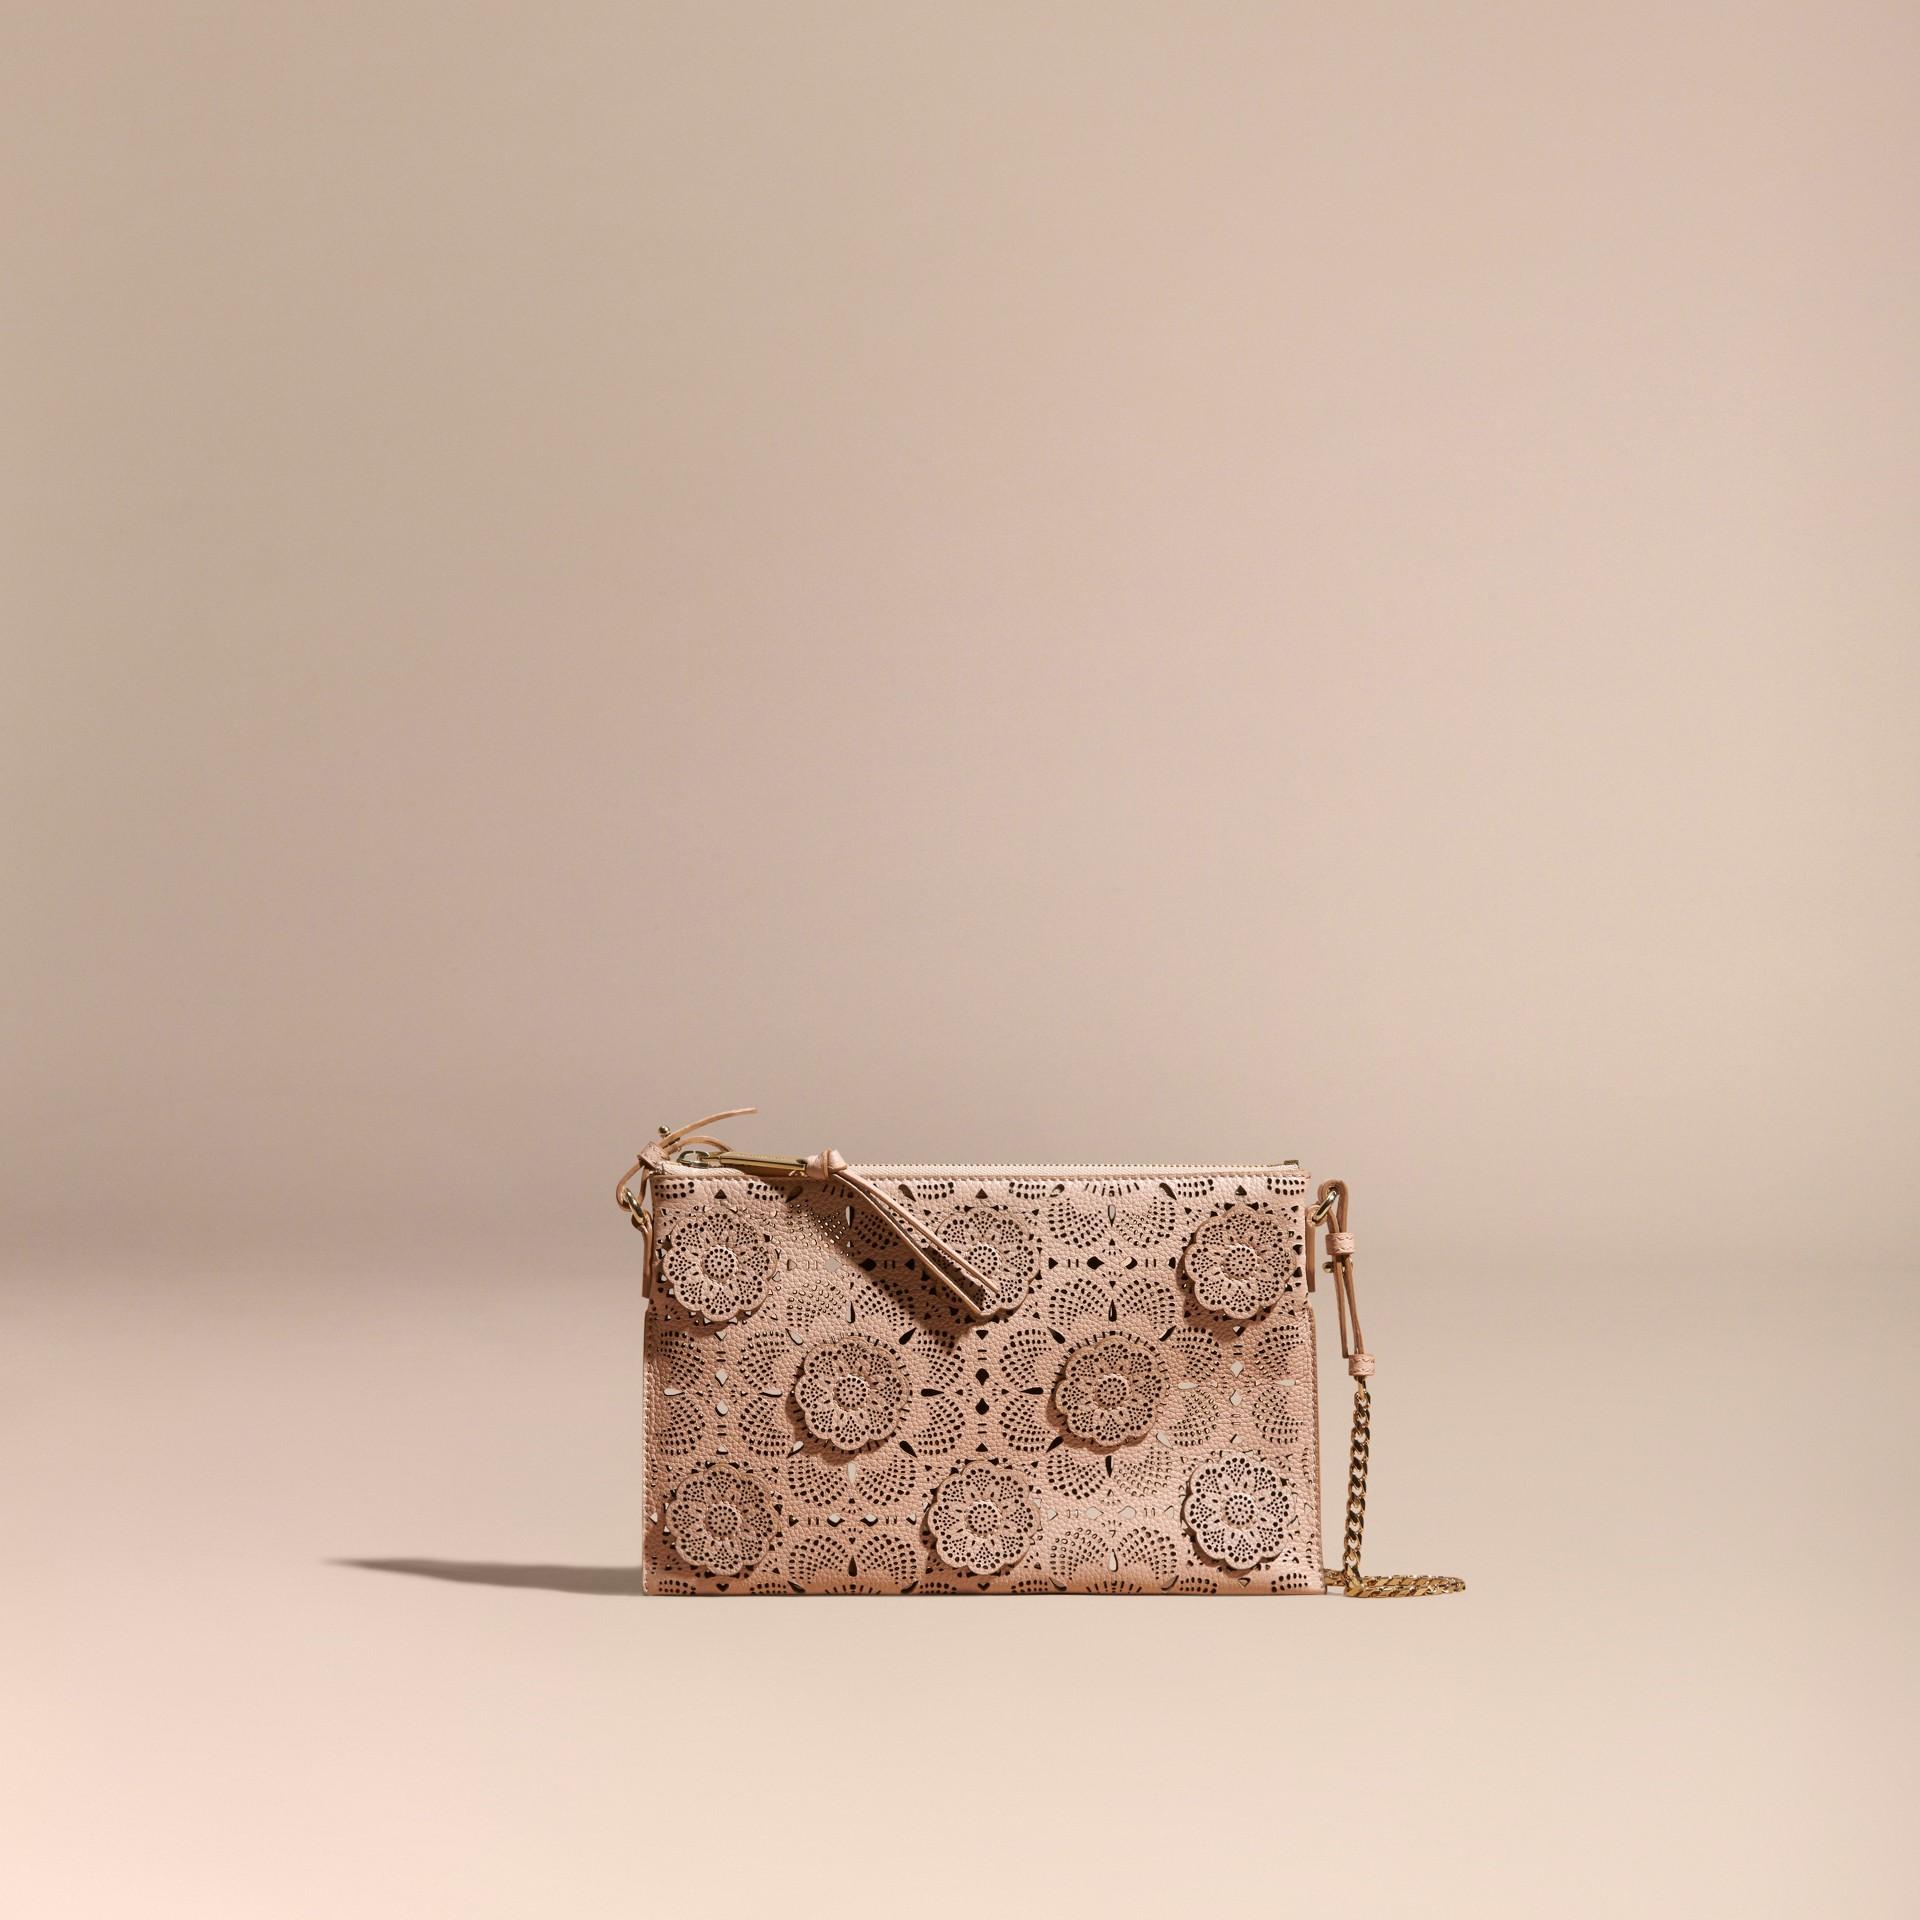 Pale apricot Laser-cut Floral Lace Leather Clutch Bag Pale Apricot - gallery image 8